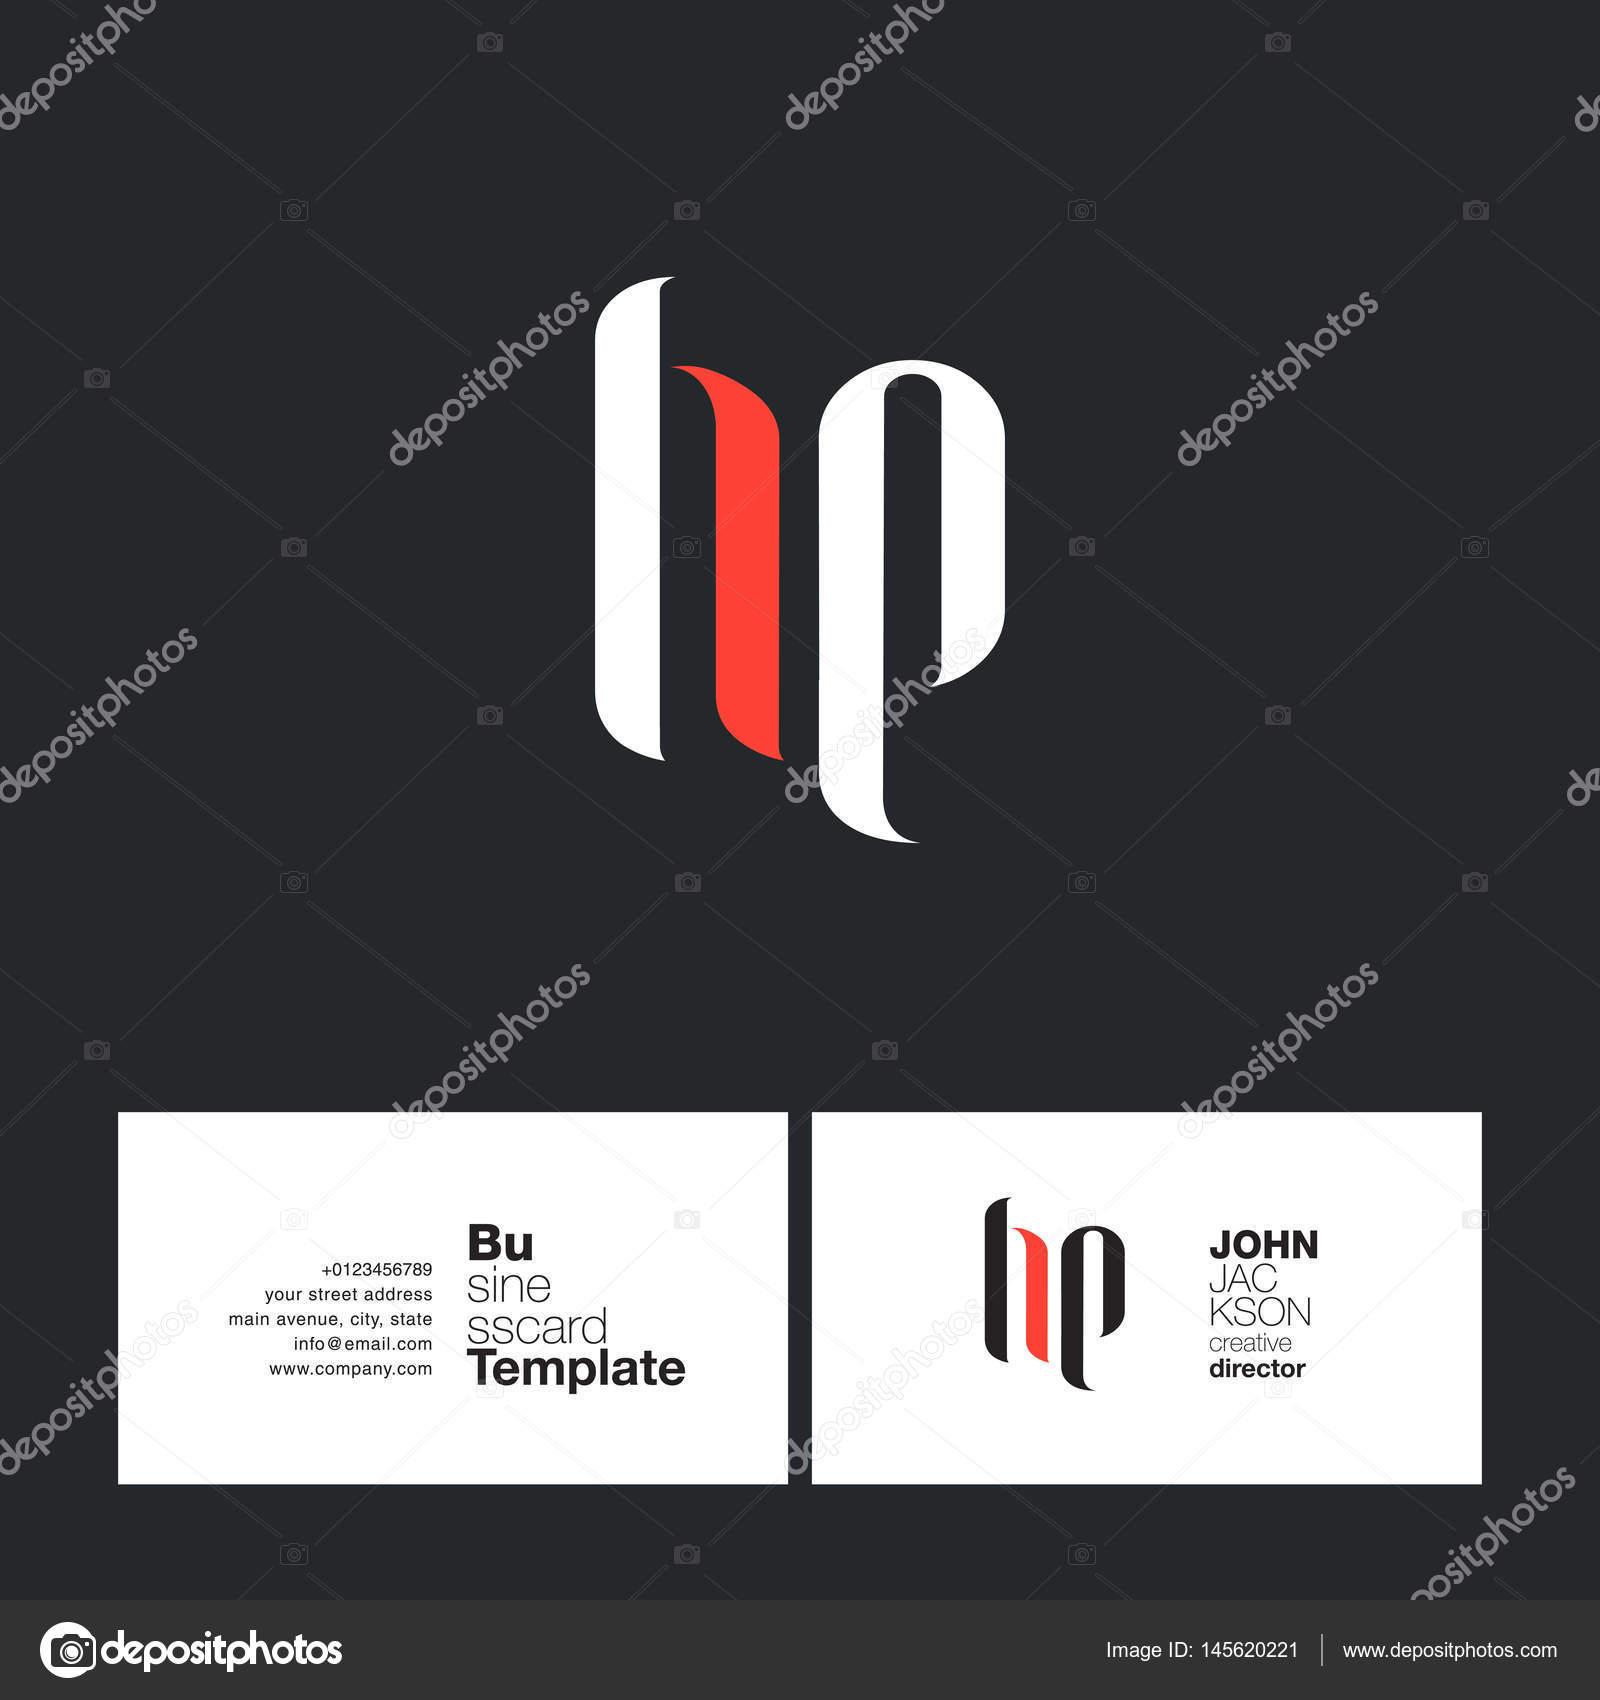 HP Letters Logo Business Card — Stock Vector © brainbistro #145620221